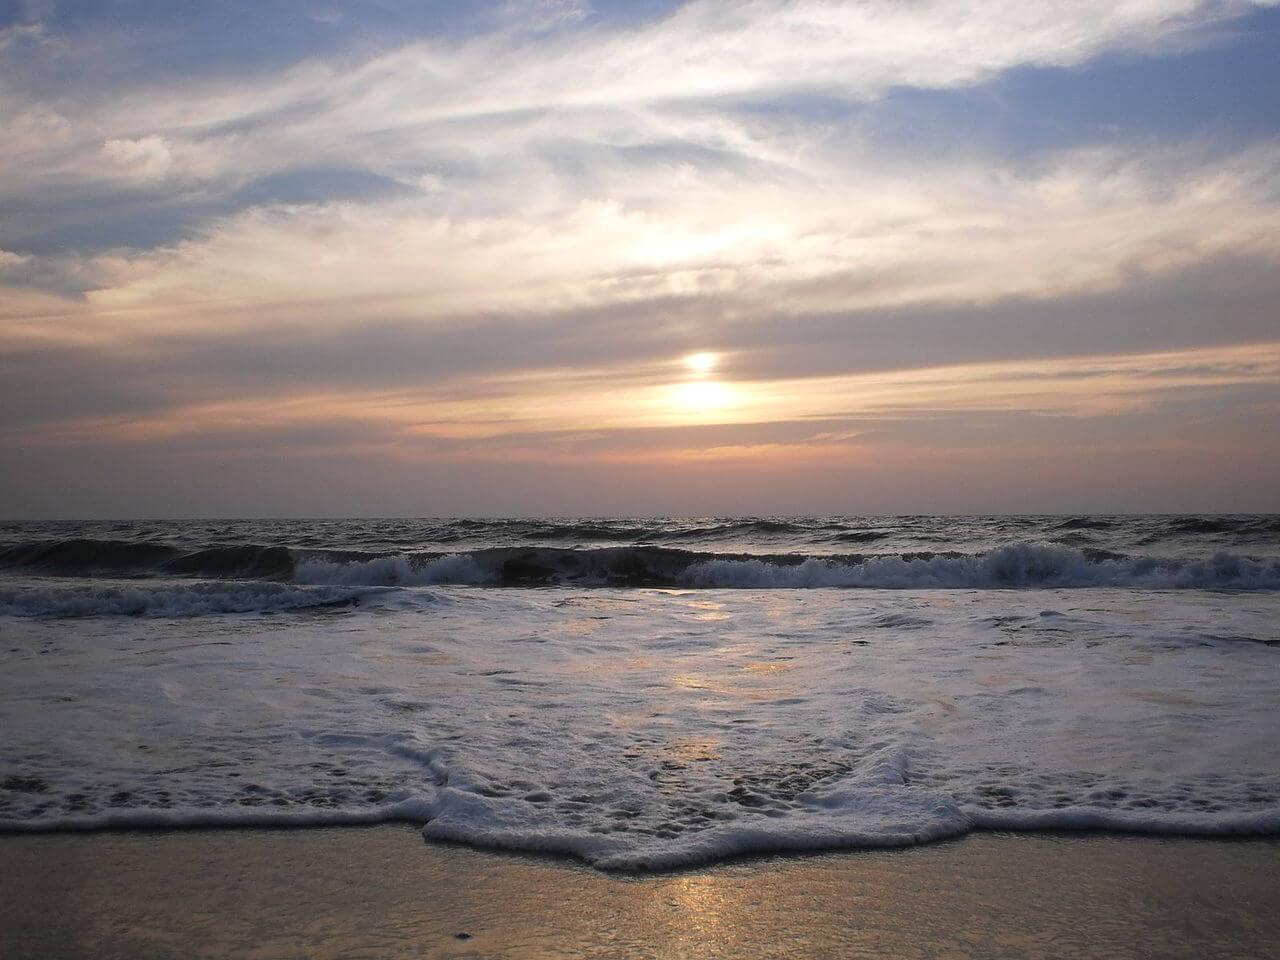 Sunset-at-cherai-beach-in-kerala-india